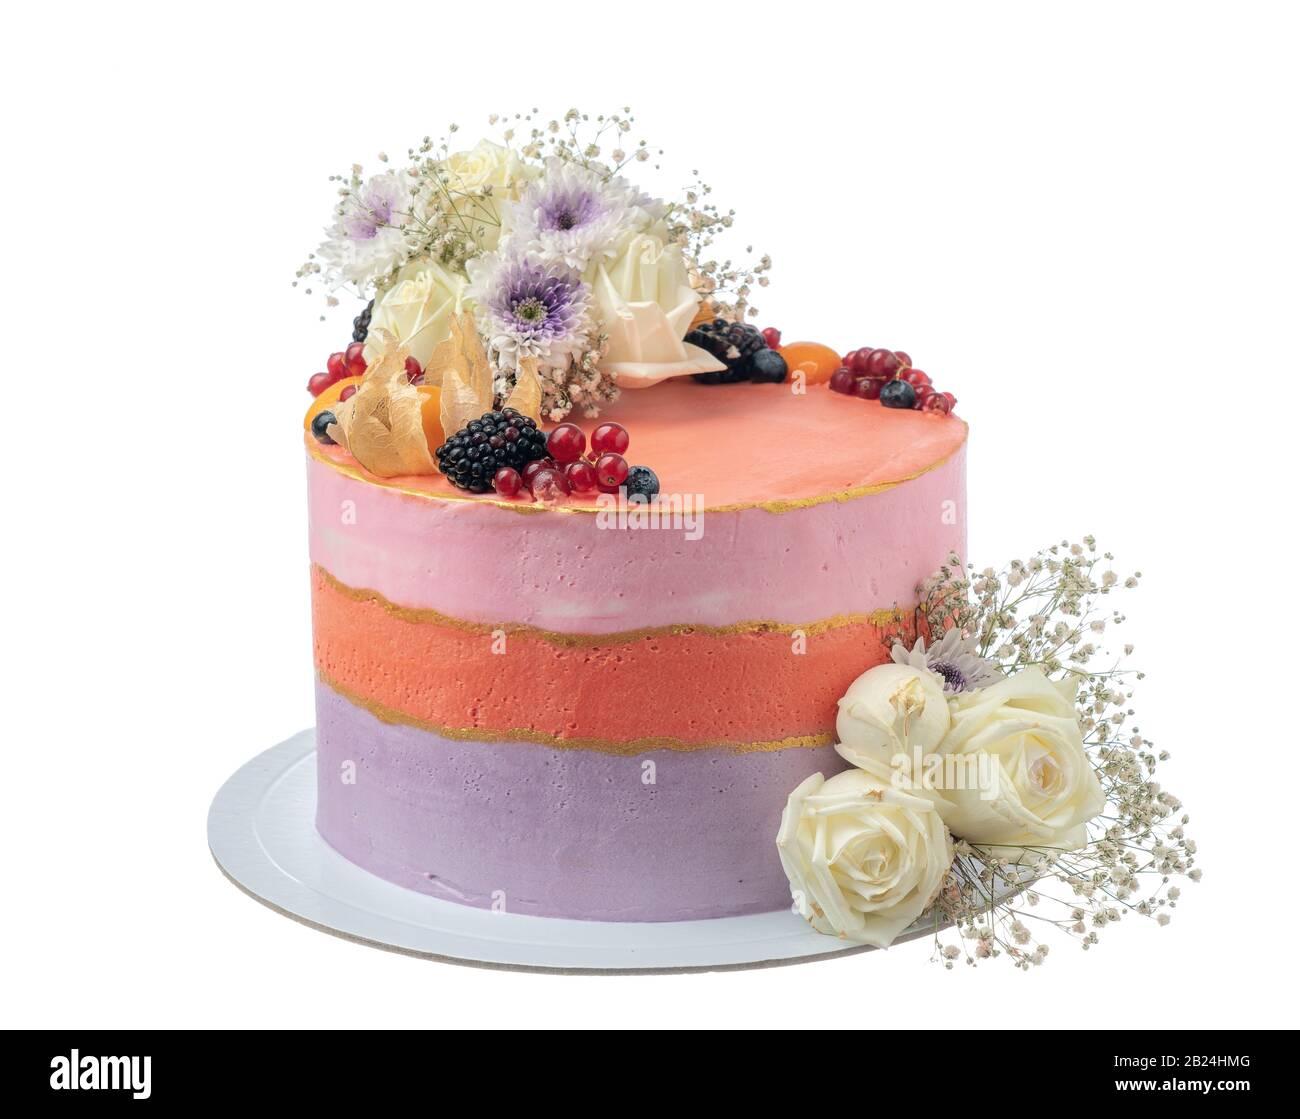 Marvelous An Elegant Birthday Cake Of Flowers And Berries On A White Personalised Birthday Cards Veneteletsinfo